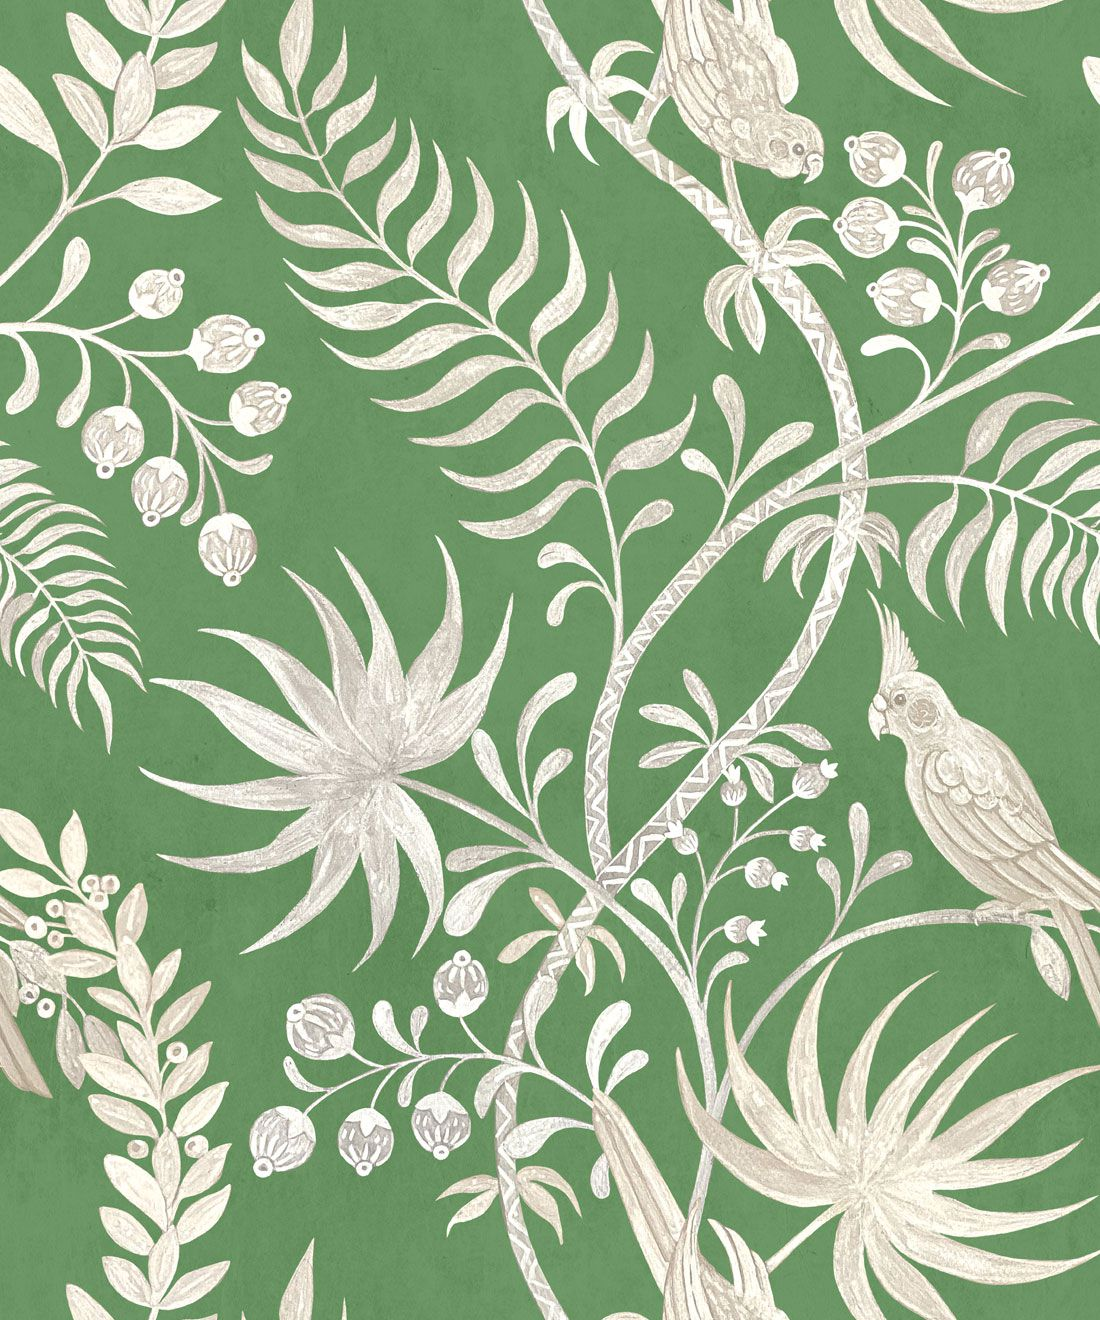 Tropicana Wallpaper • Fern Green • Swatch